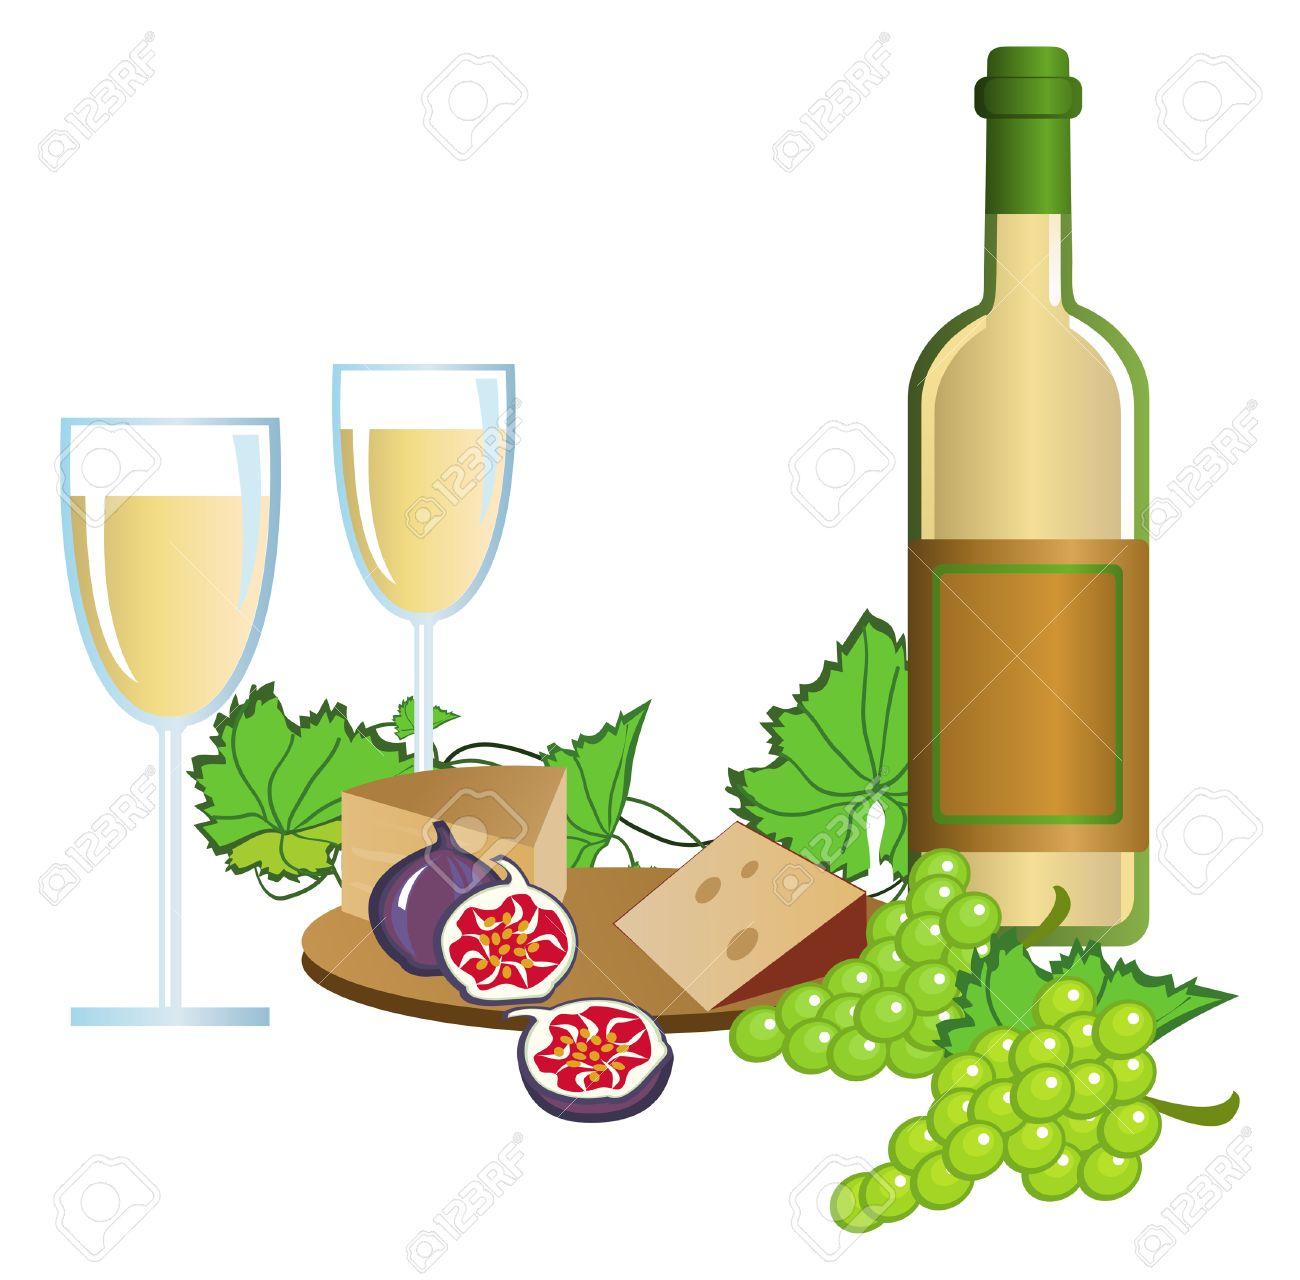 clip arts of wine fruits and cheese royalty free cliparts vectors rh 123rf com Wine Clip Art Wine Glass Clip Art